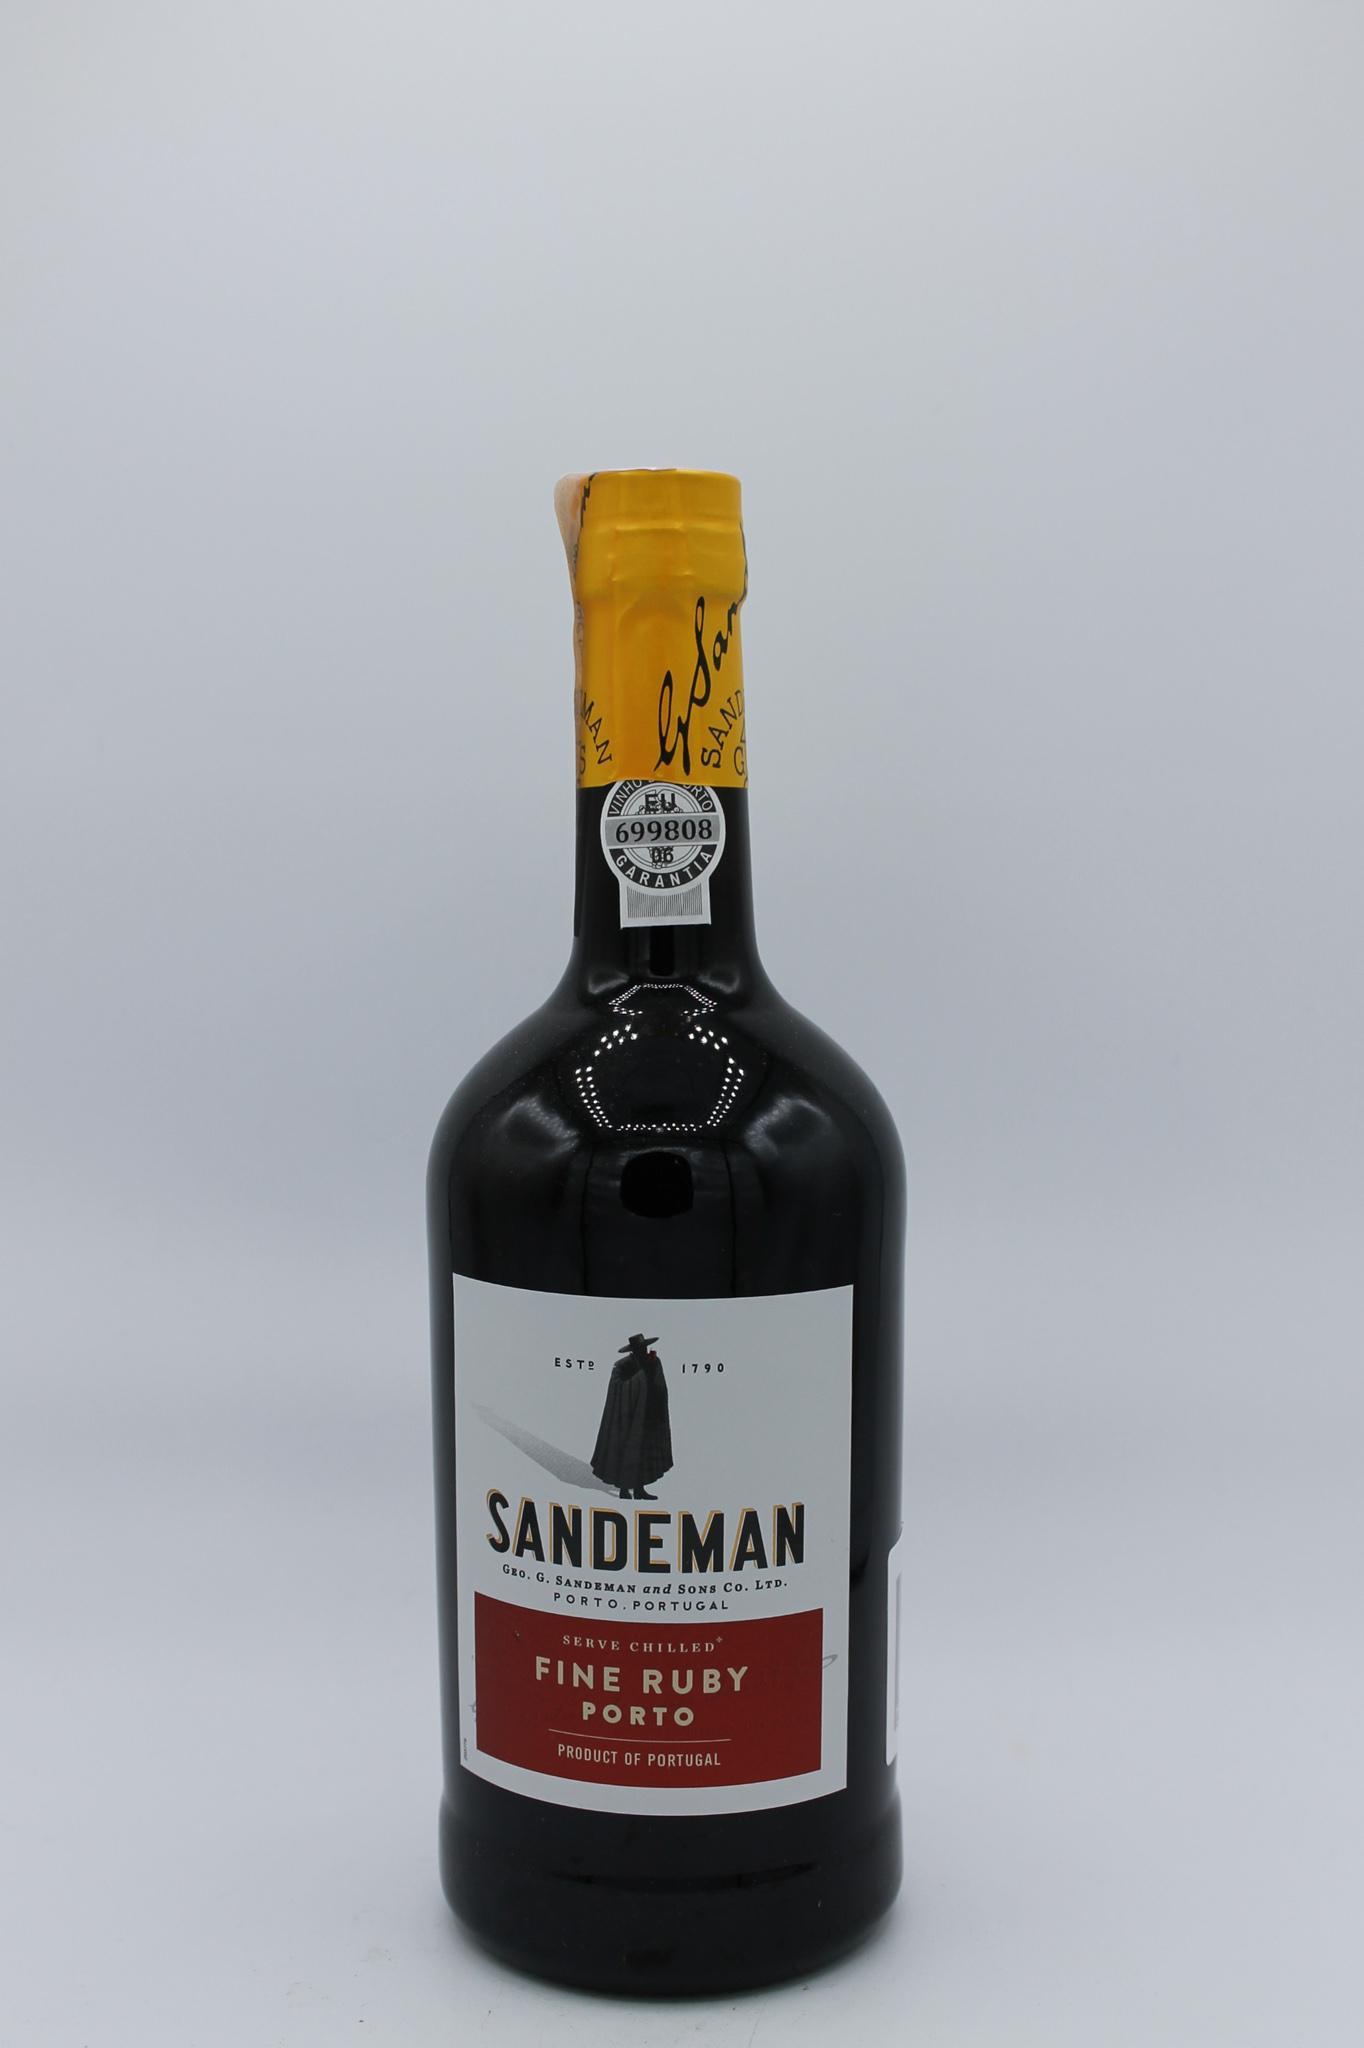 Sandeman porto bottiglia 750ml.